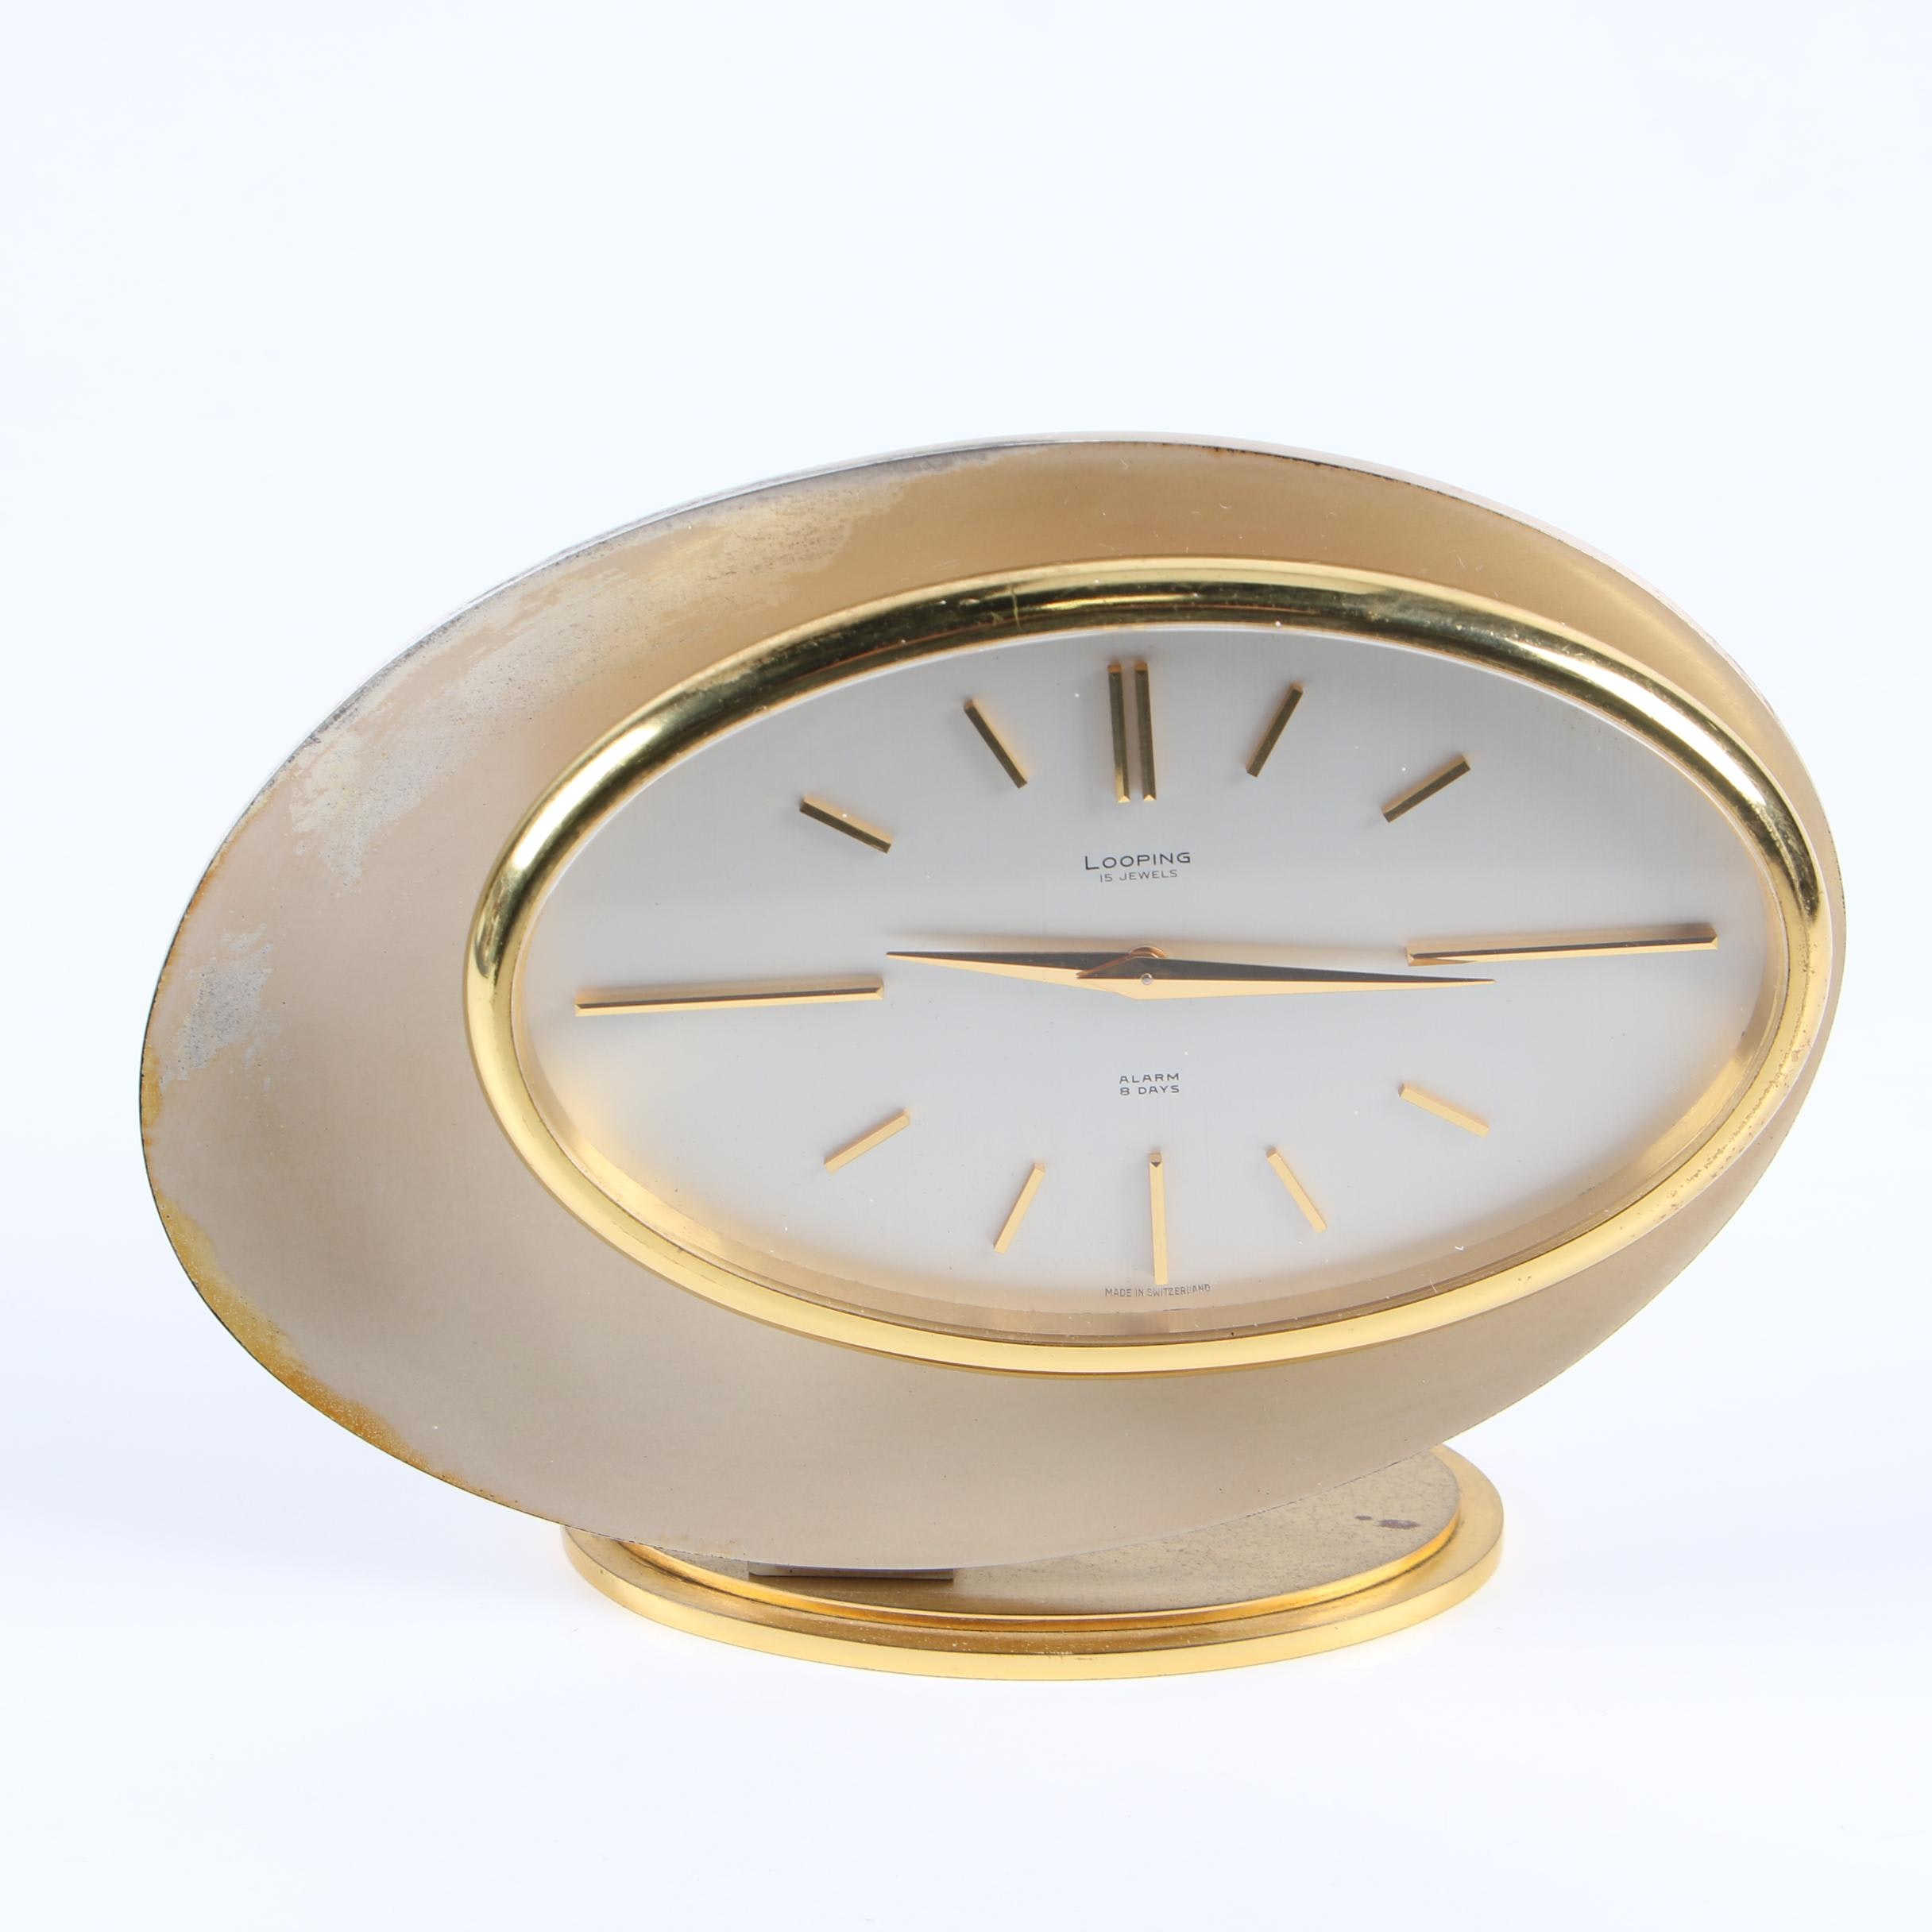 Looping 15 Jewel Eight Day Alarm Clock, Mid-Century